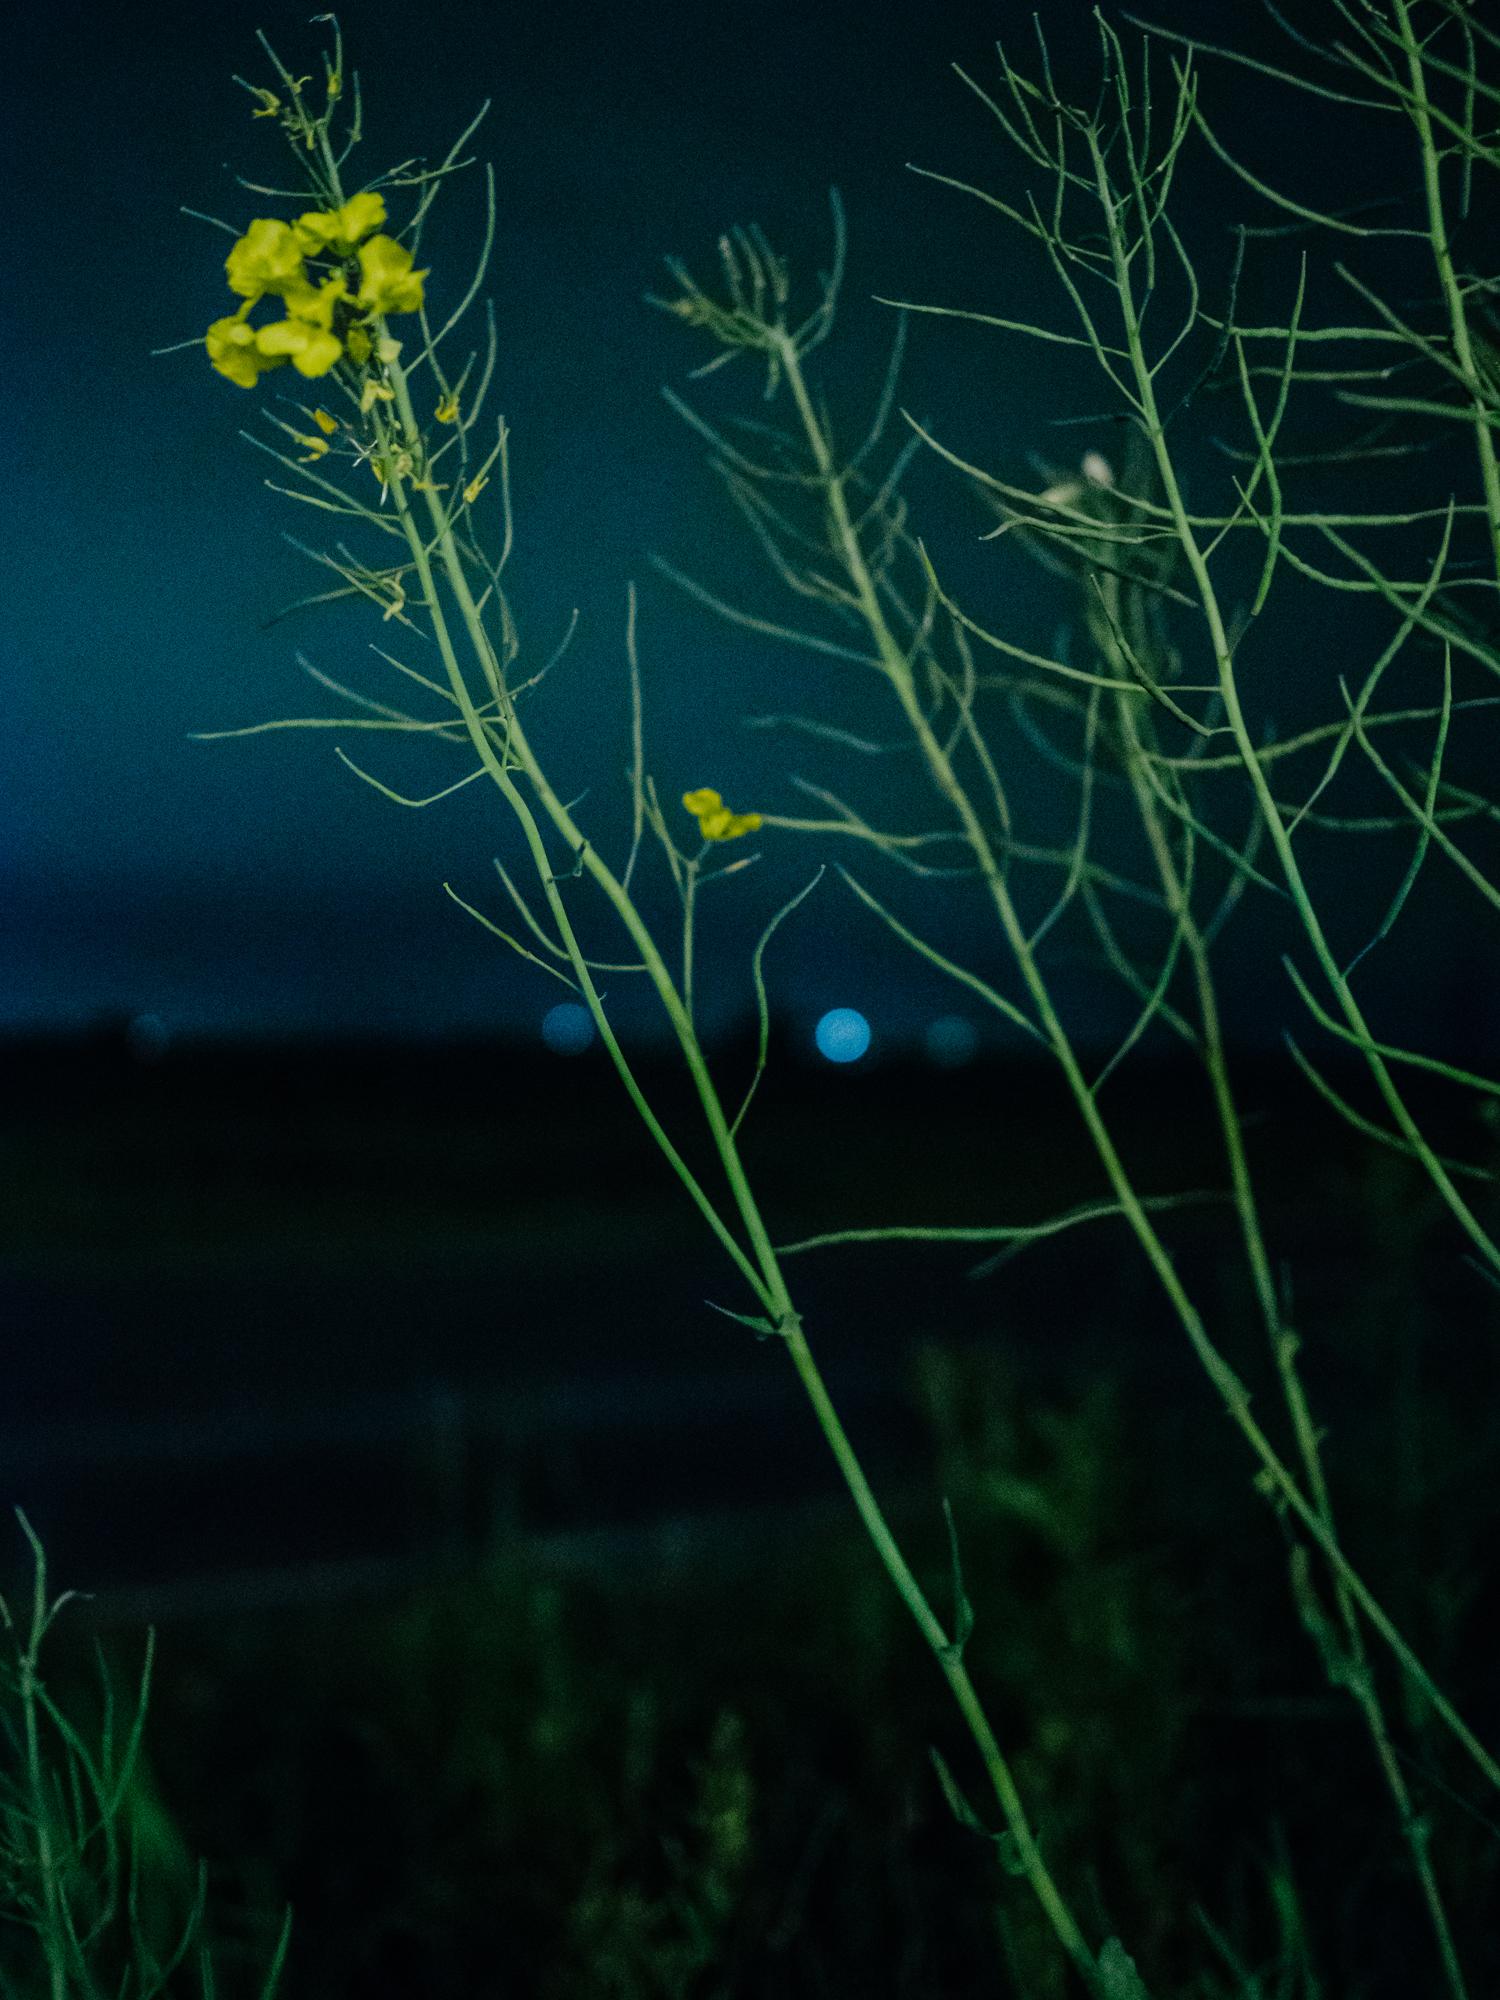 nachts-04.jpg